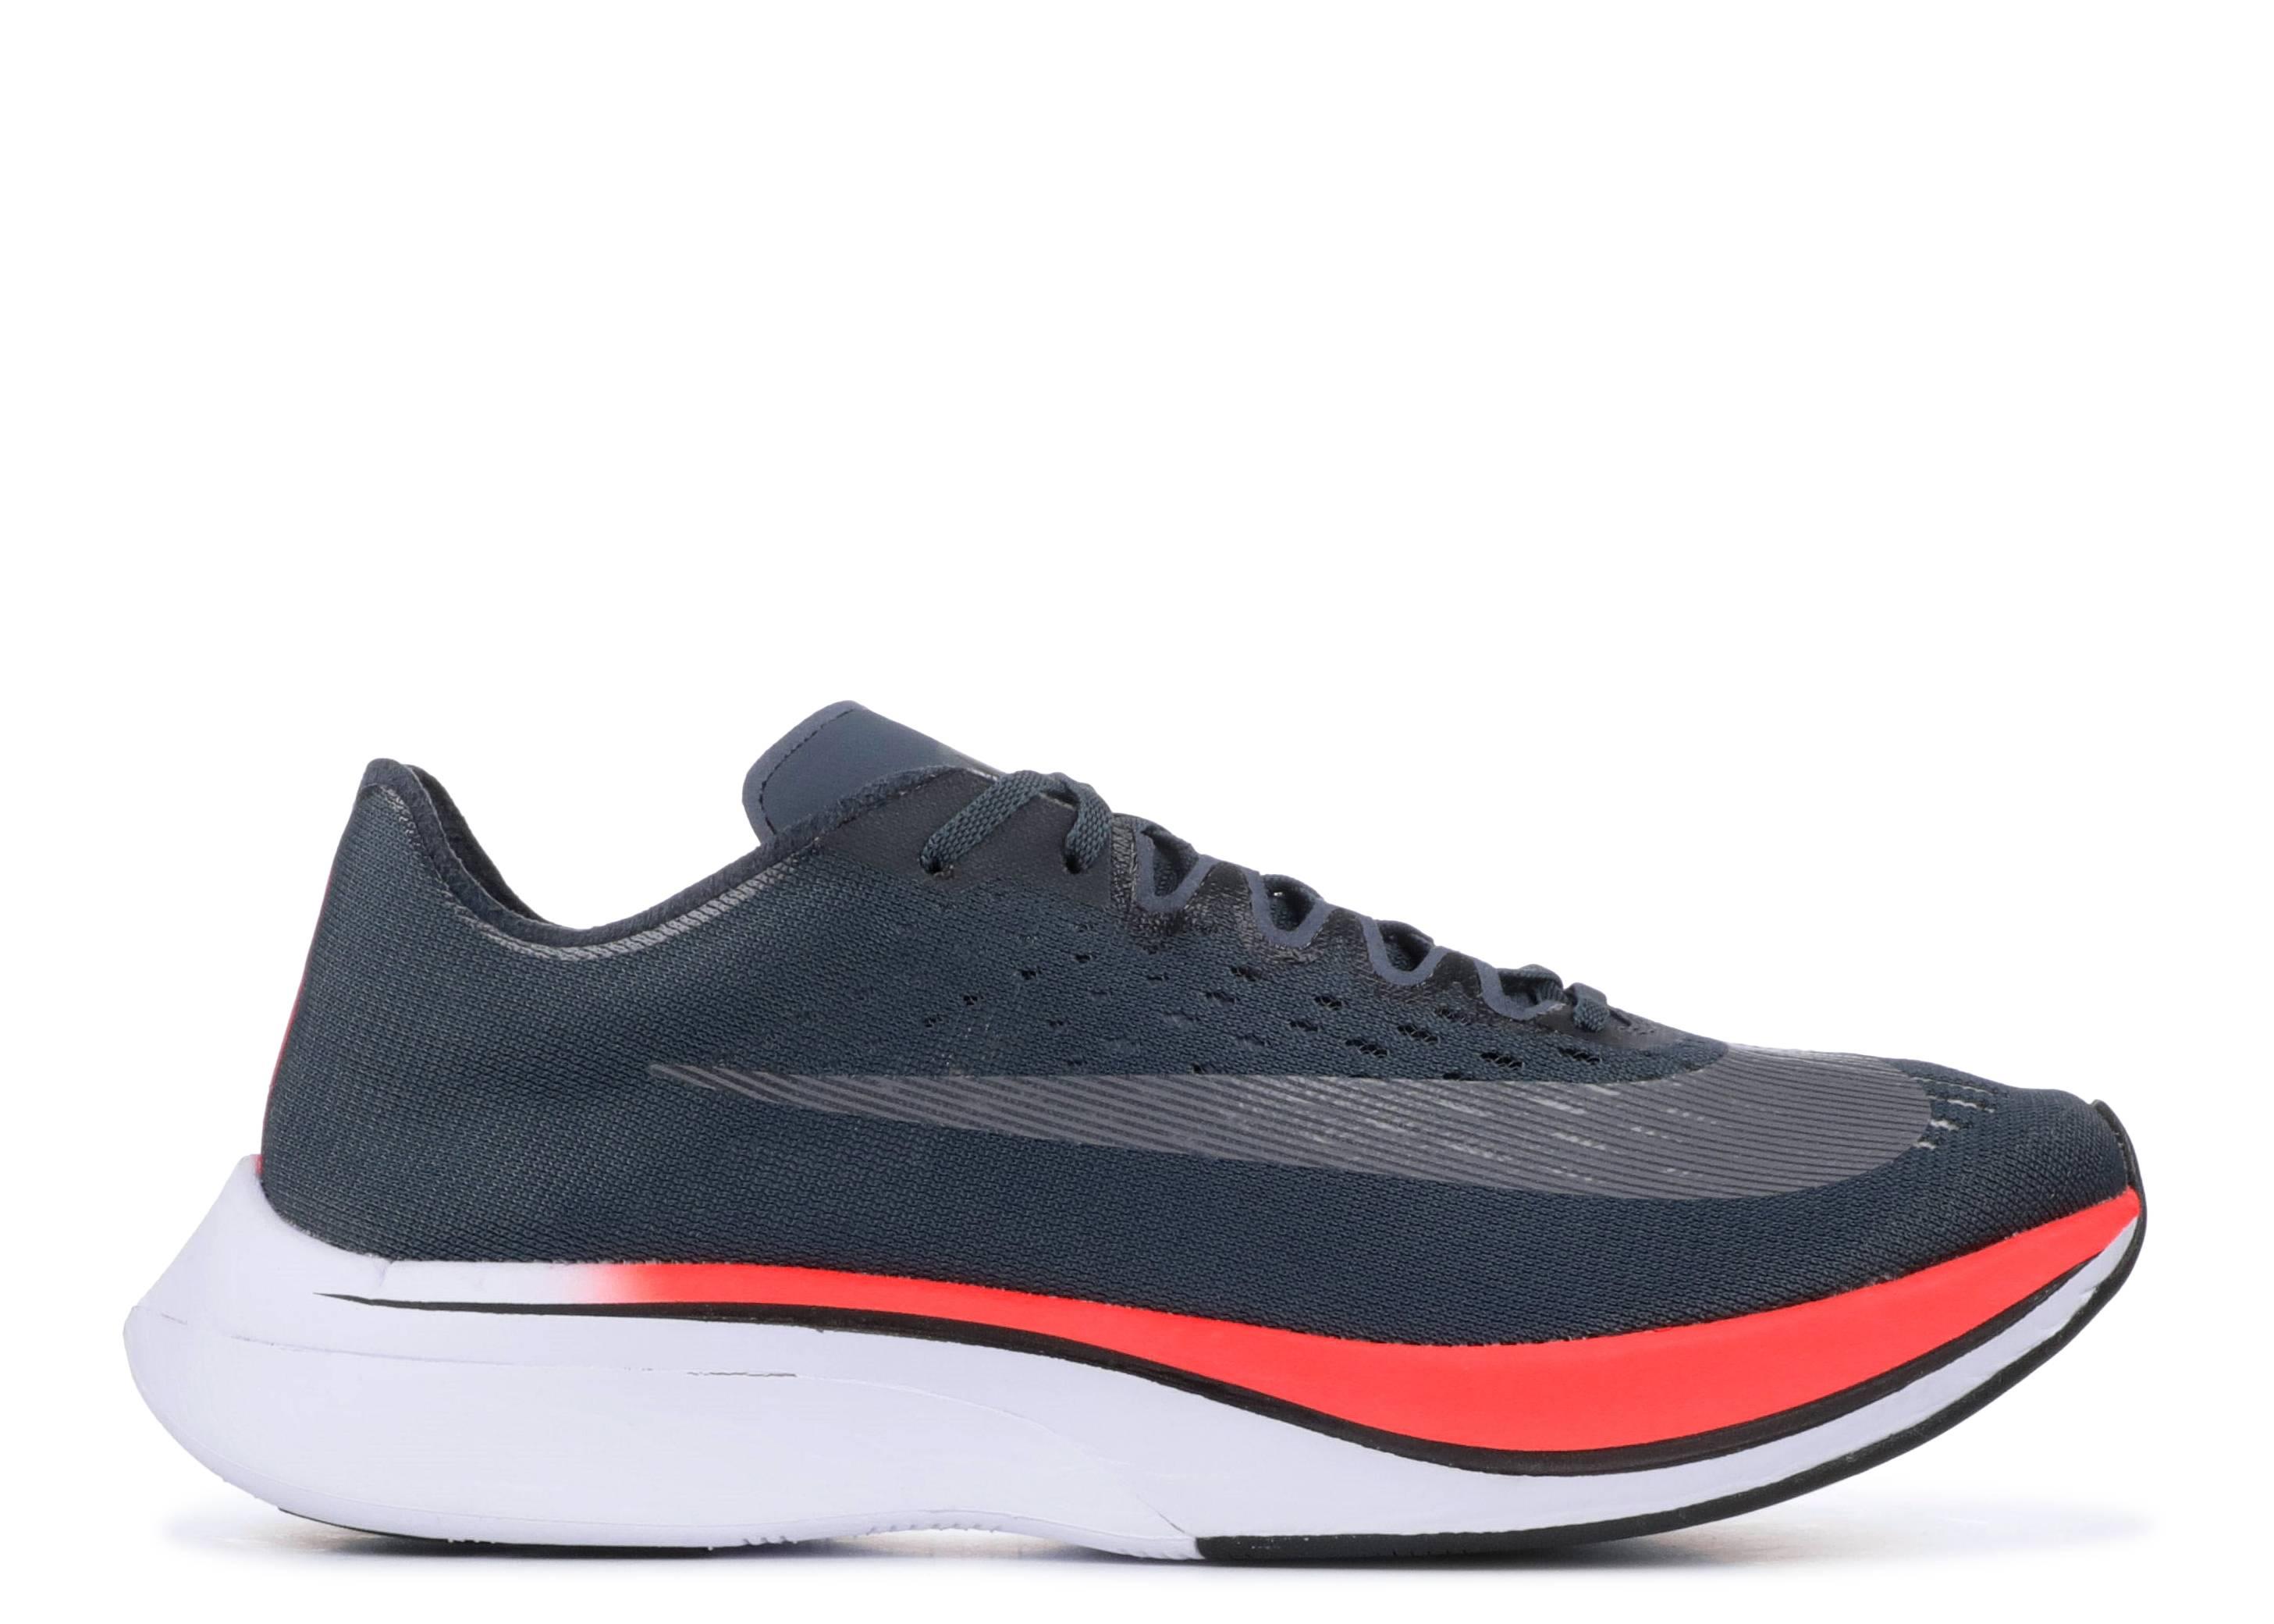 Nike Zoom Vaporfly 4%